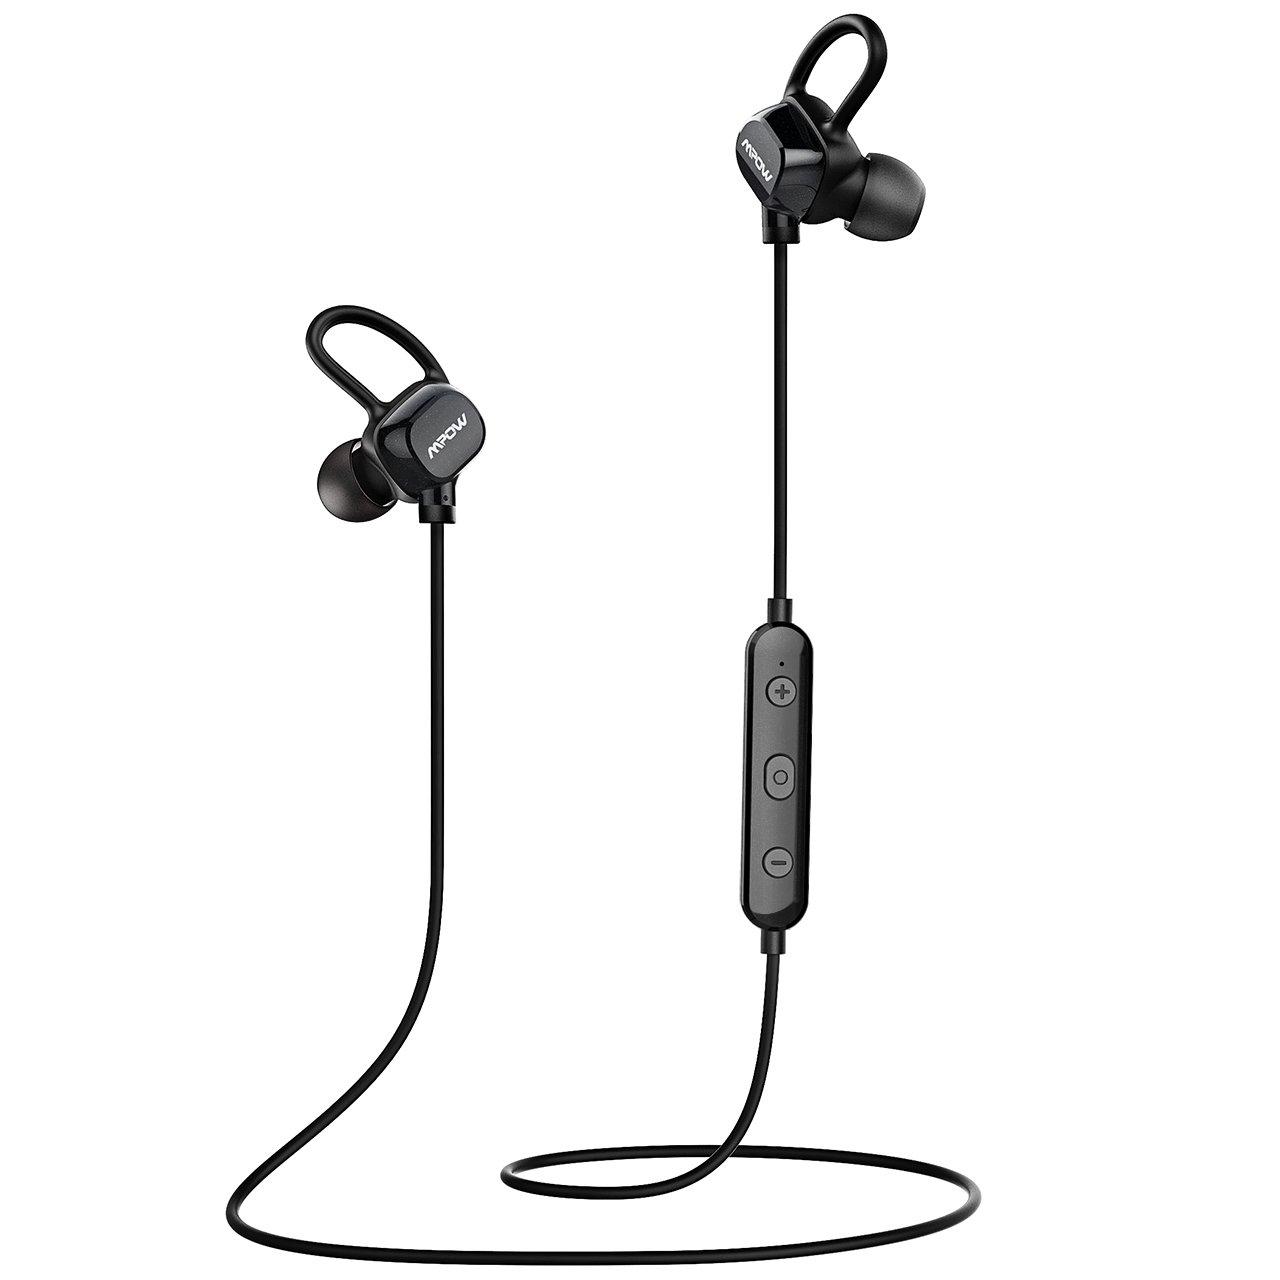 Mpow Bluetooth Headphones Wireless Earbuds Sport Running Upgraded IPX5 Splash Proof Stereo Mini